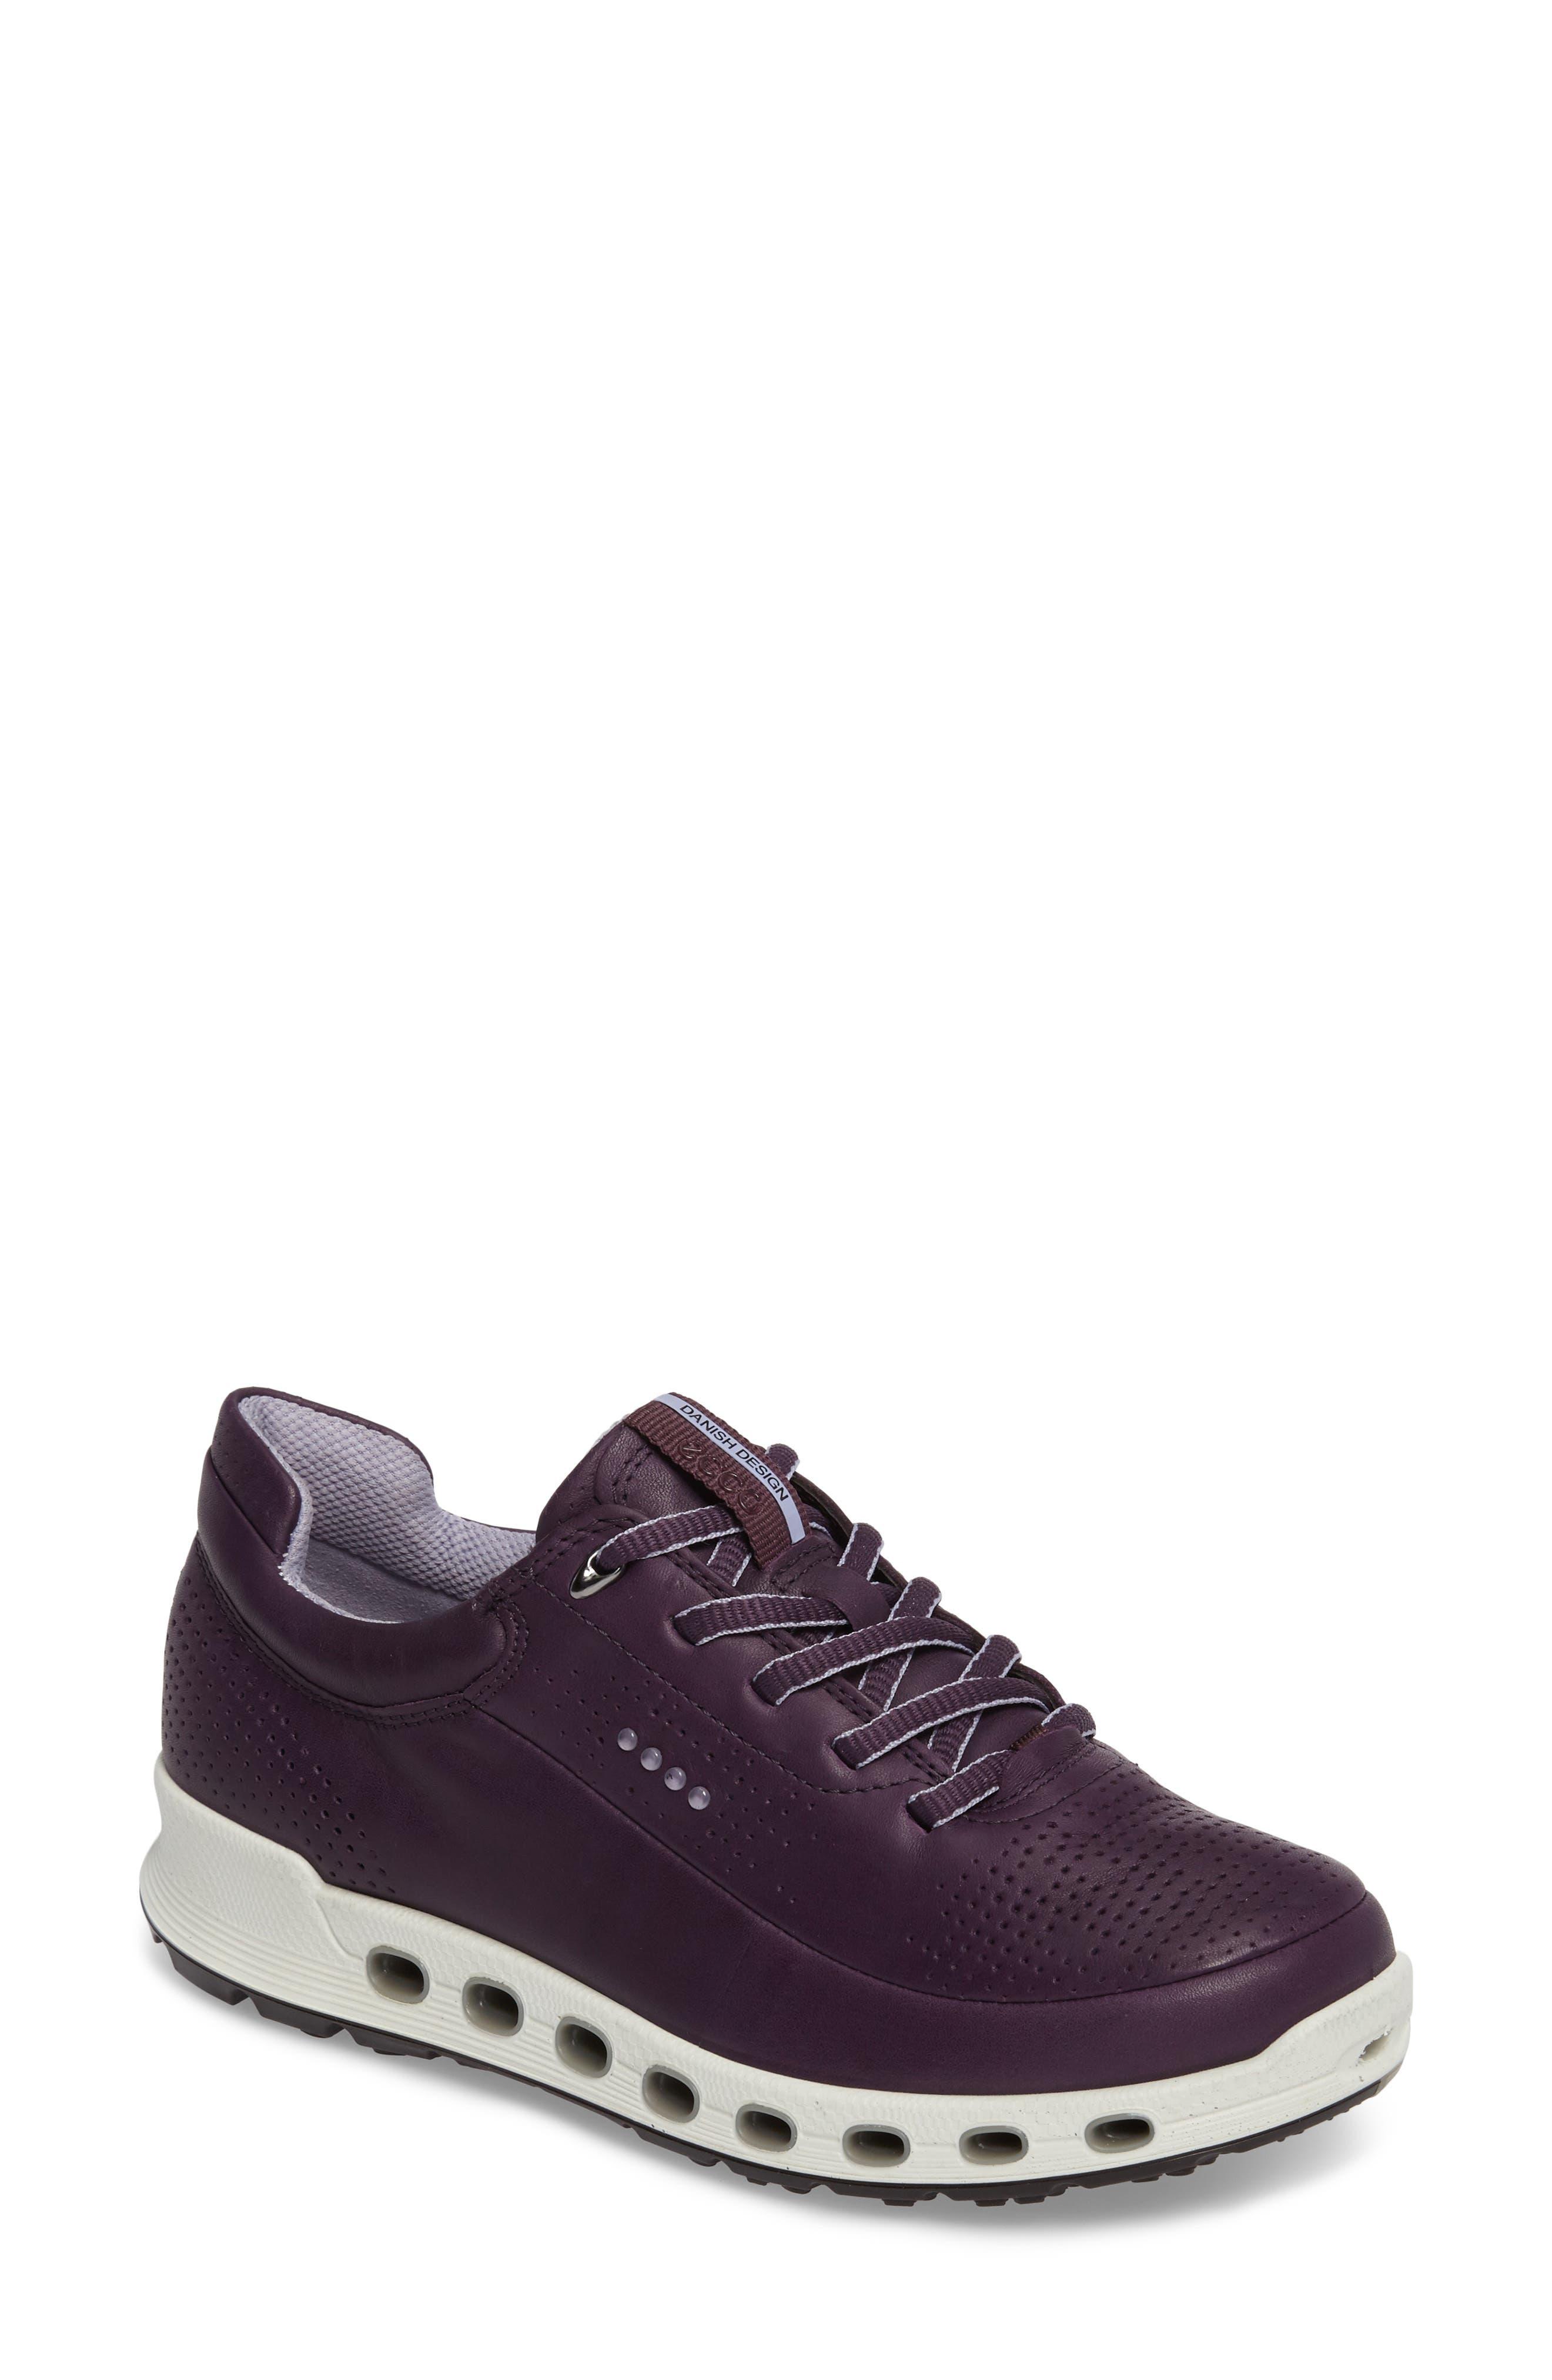 Cool 2.0 GTX Waterproof Sneaker,                         Main,                         color, 500